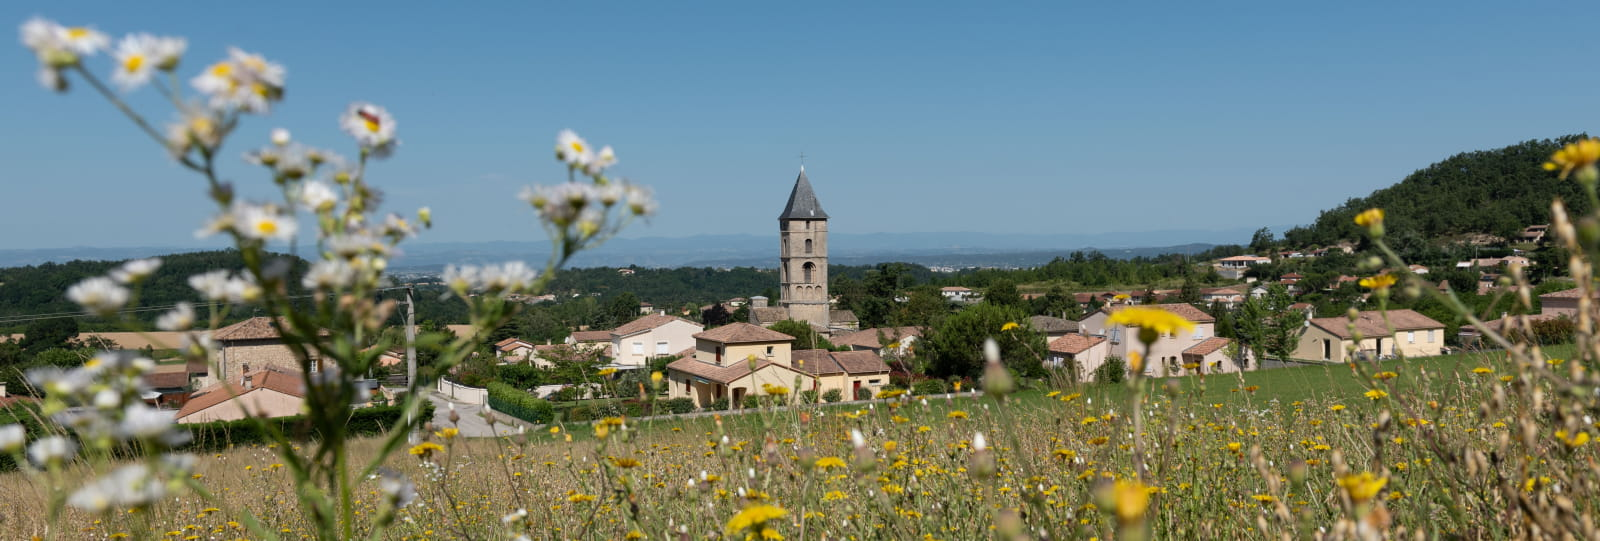 Village de Beauregard-Baret